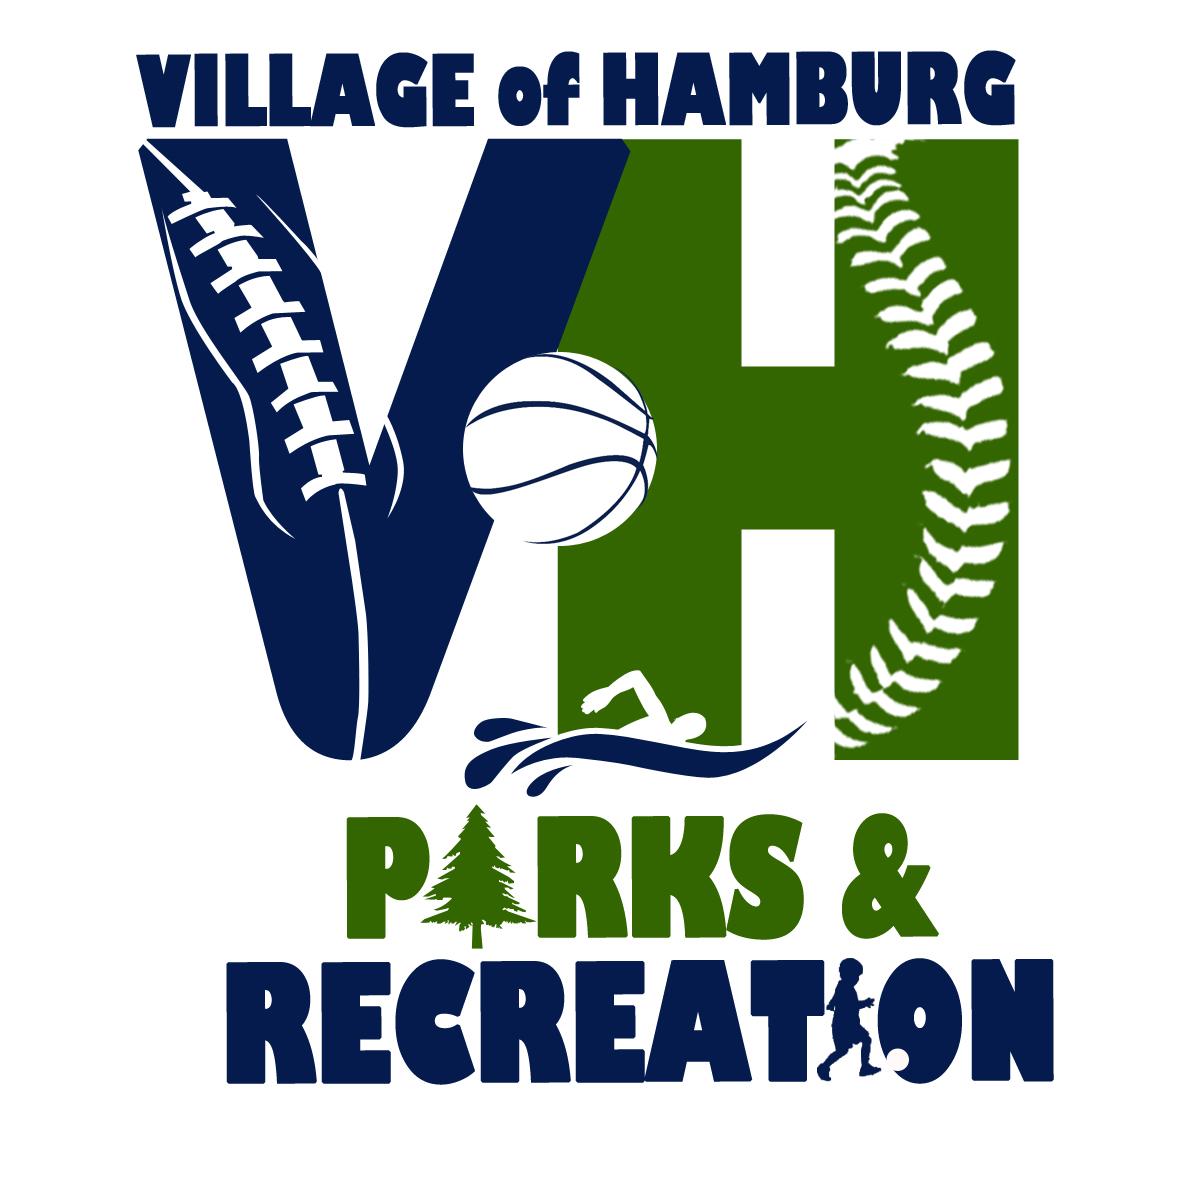 Parks and recreation village of hamburg new york parks and recreation department reheart Image collections